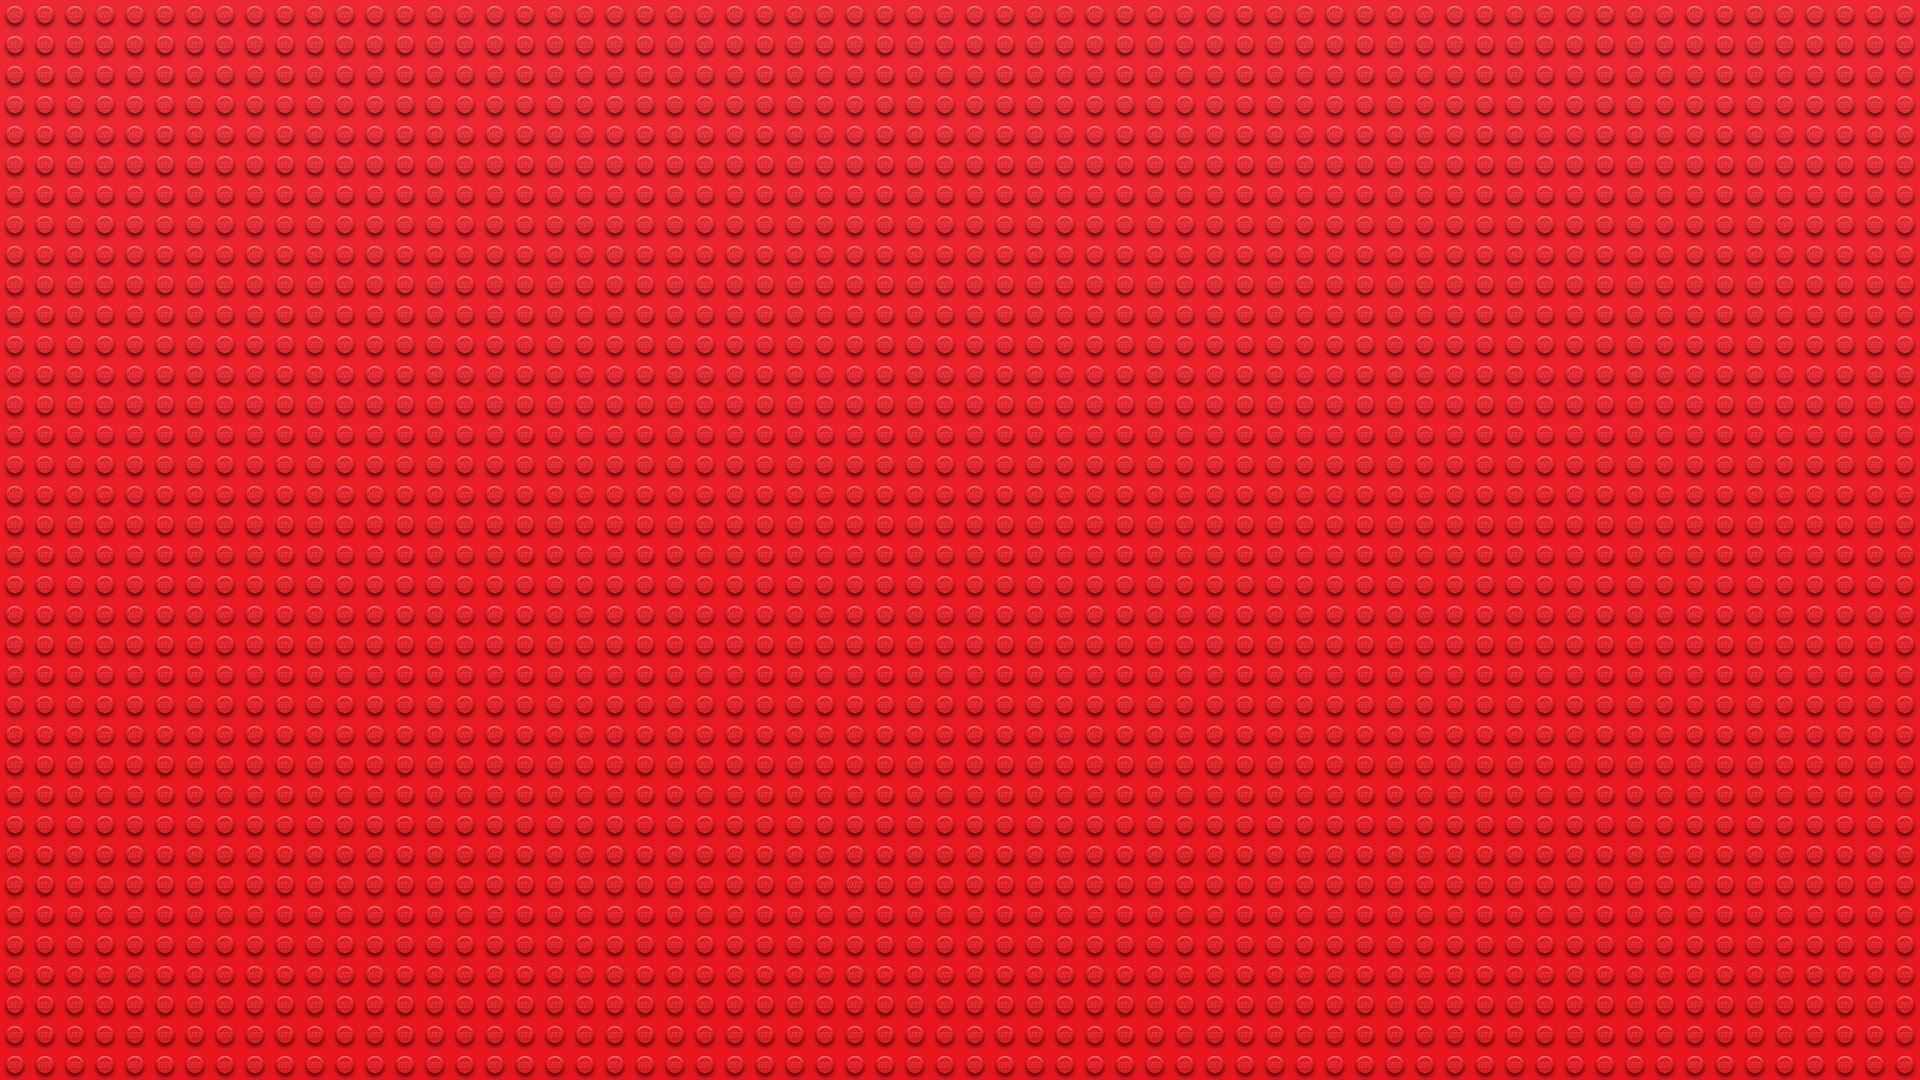 Download red studs lego wallpaper HD wallpaper 1920x1080